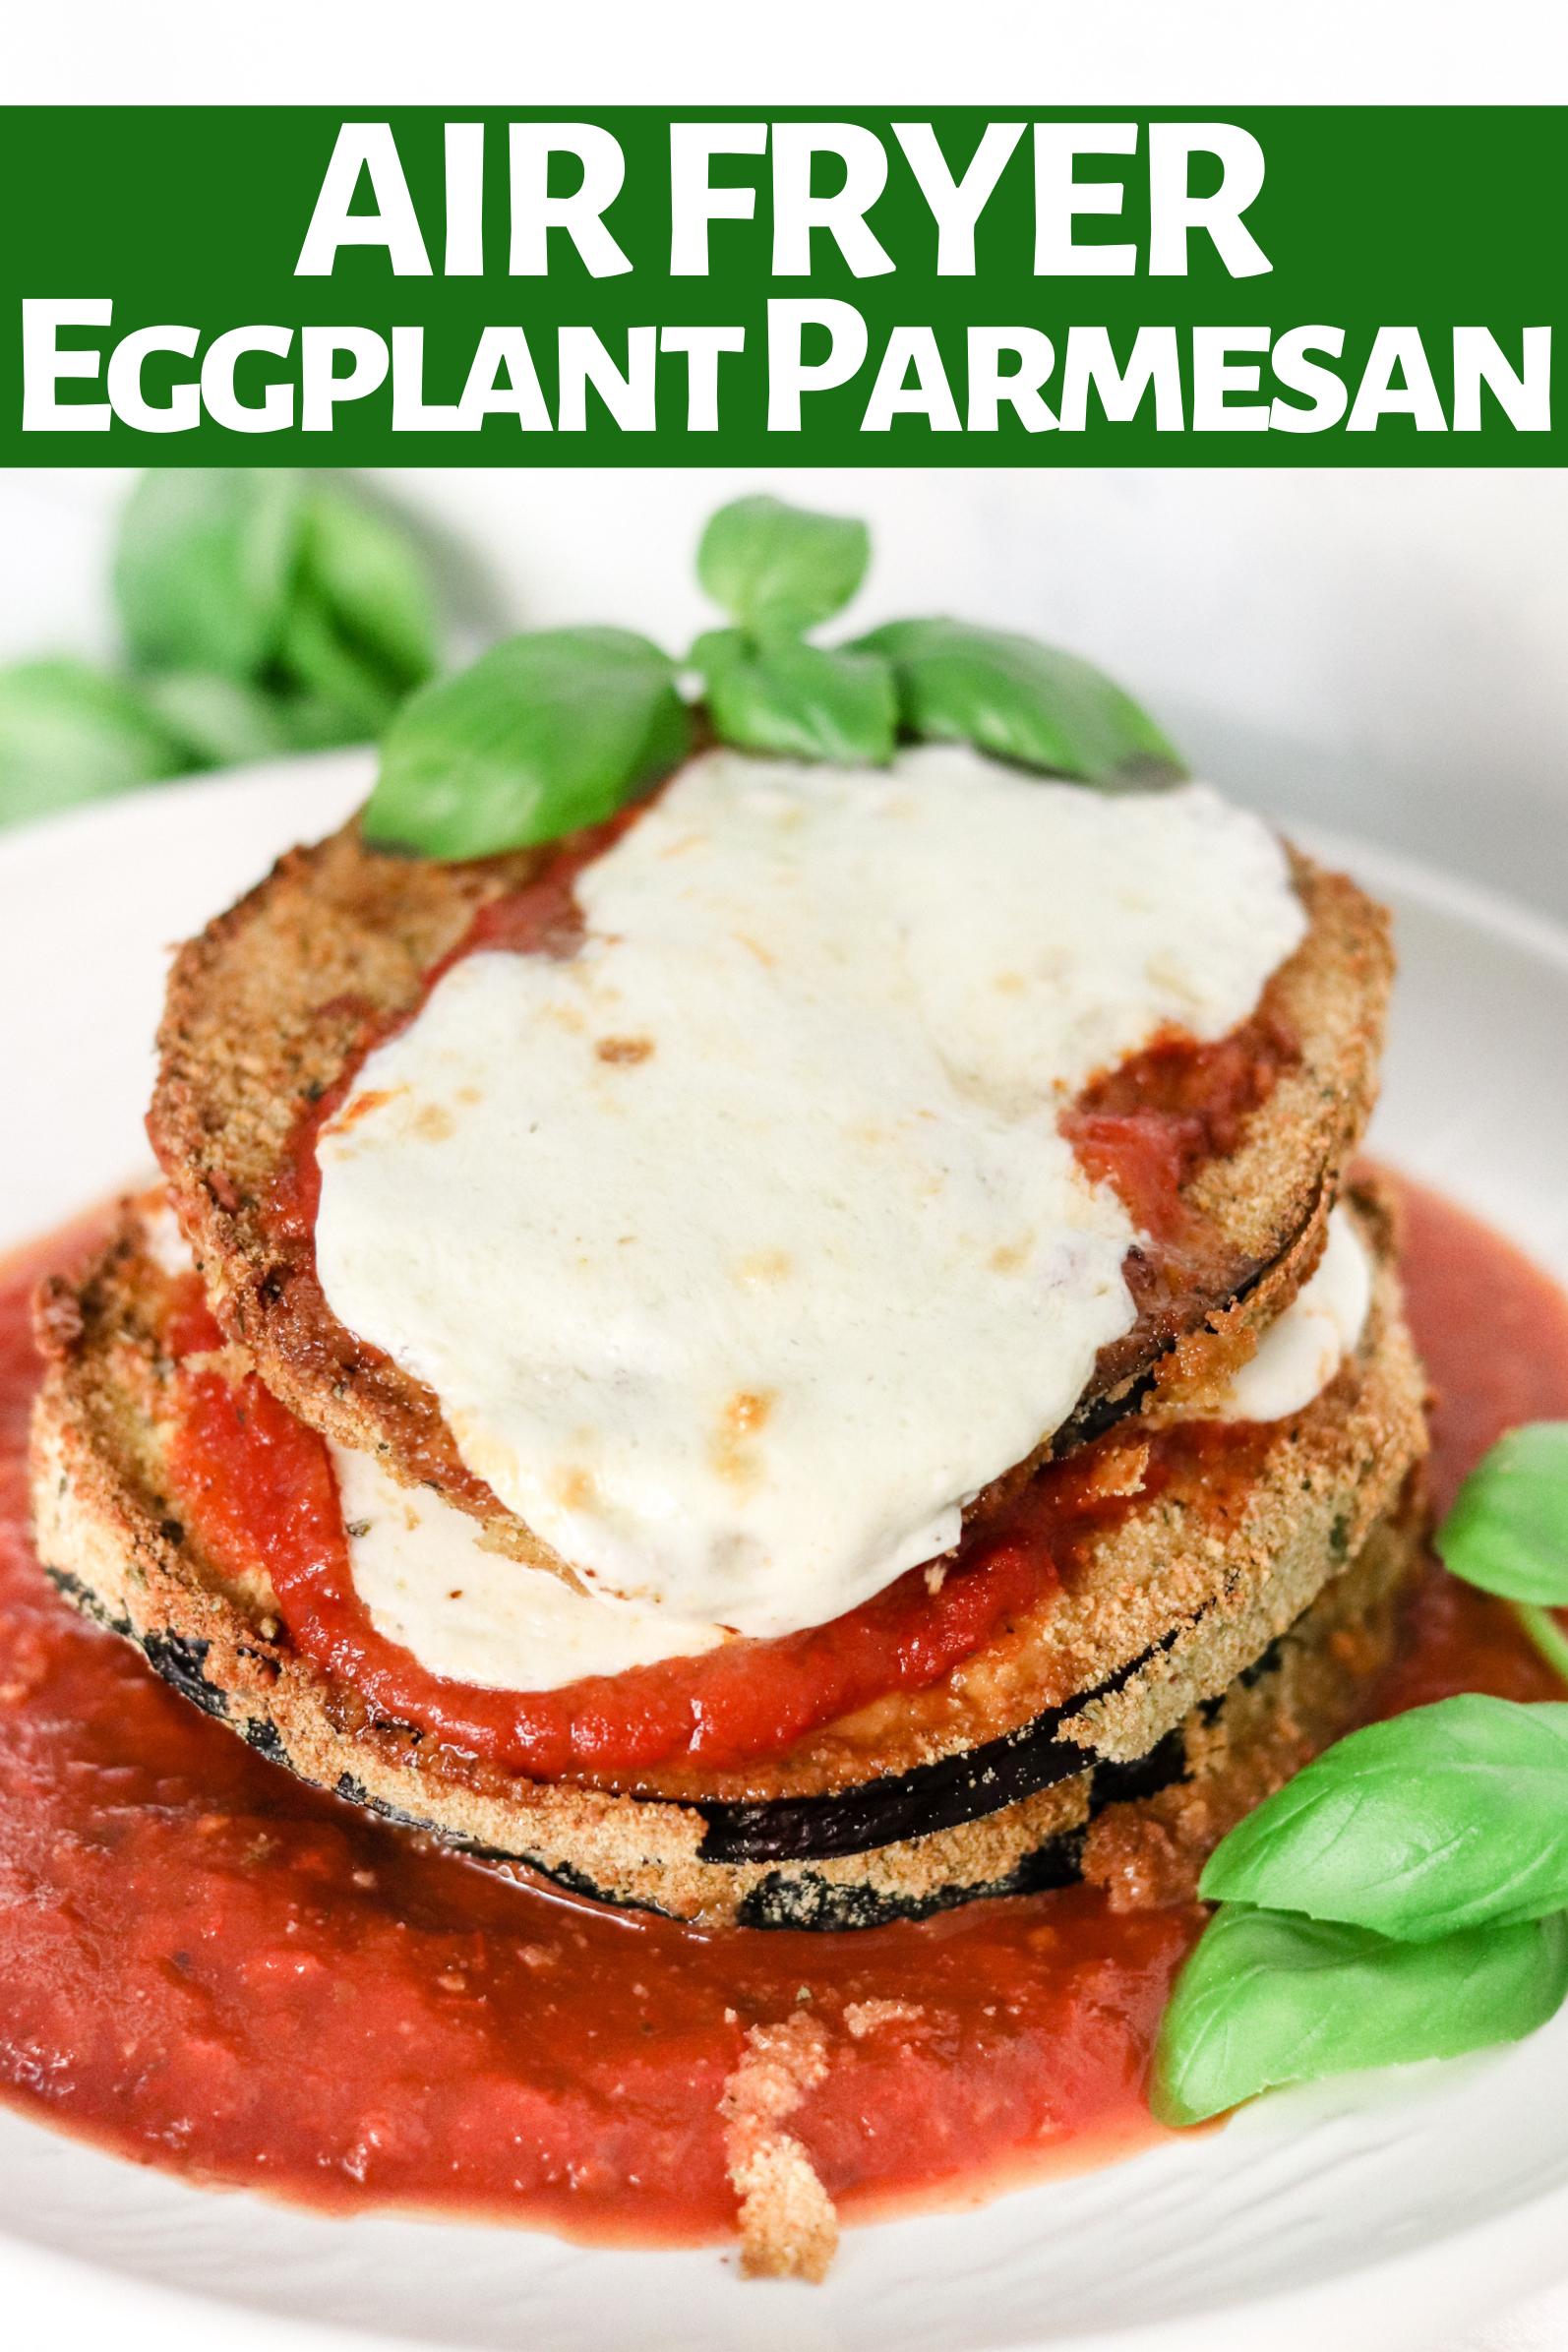 Air Fryer Eggplant Parmesan No Oil Recipe In 2020 Health Dinner Recipes Eggplant Parmesan Air Fryer Recipes Easy